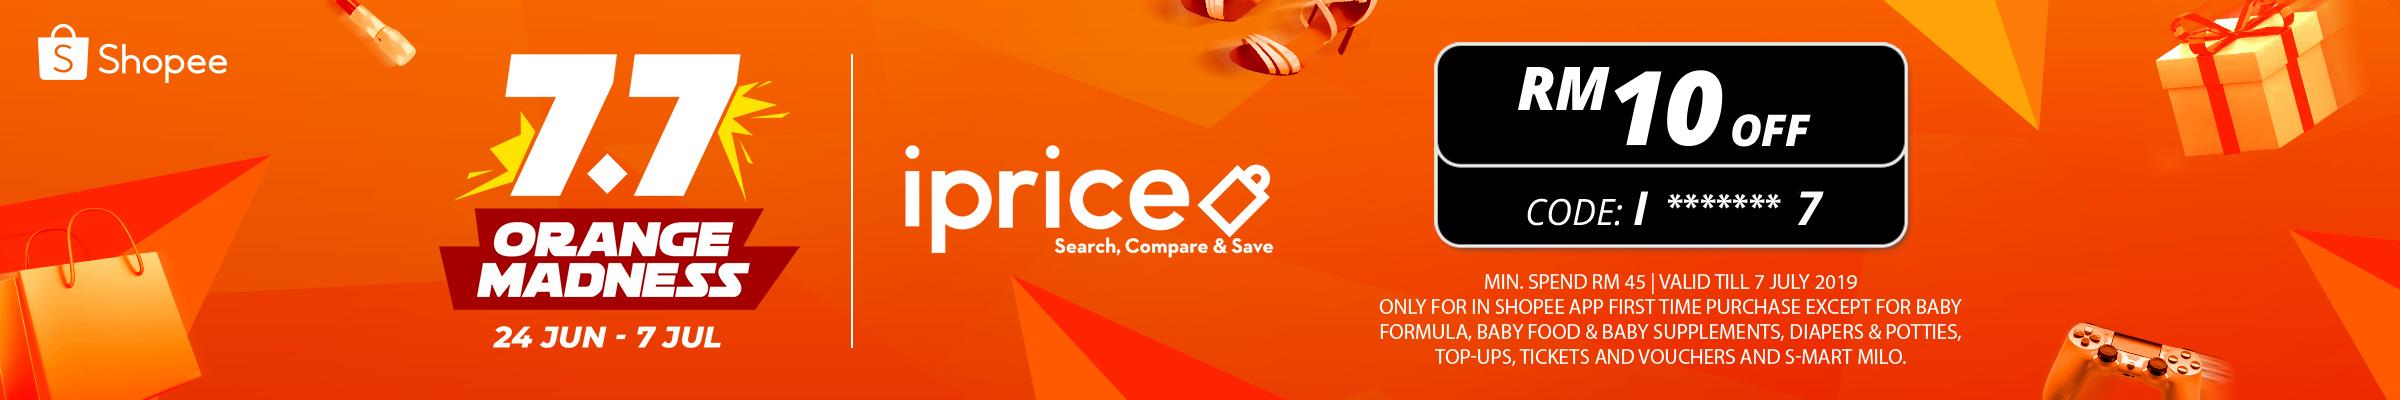 Shopee Orange Madness (till 7 July)